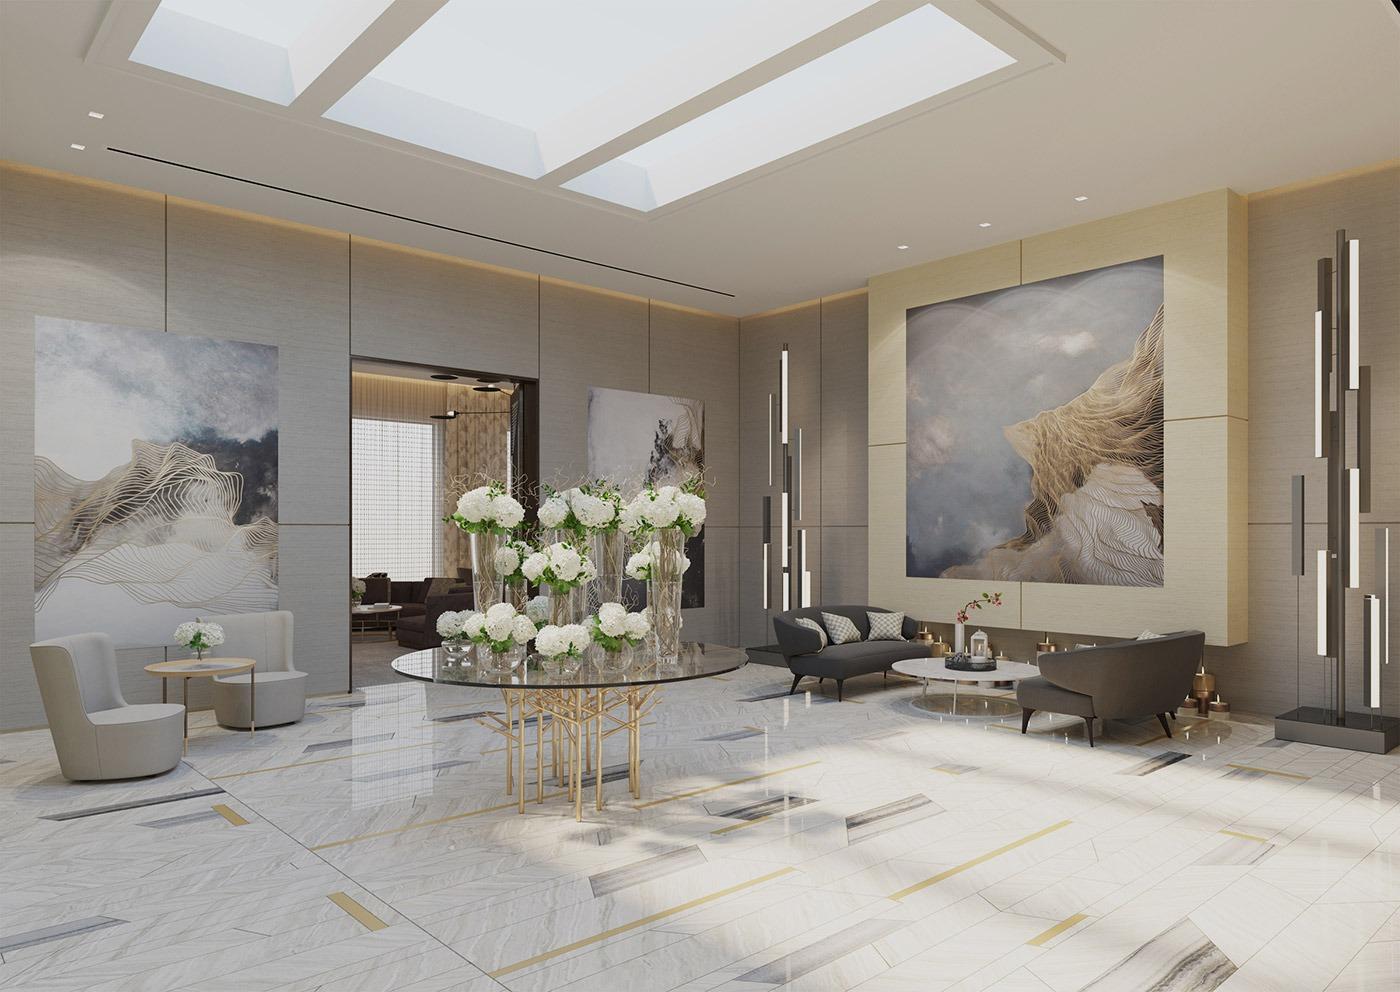 Interior Designer Dubai From CeciliaClasonInteriors.com